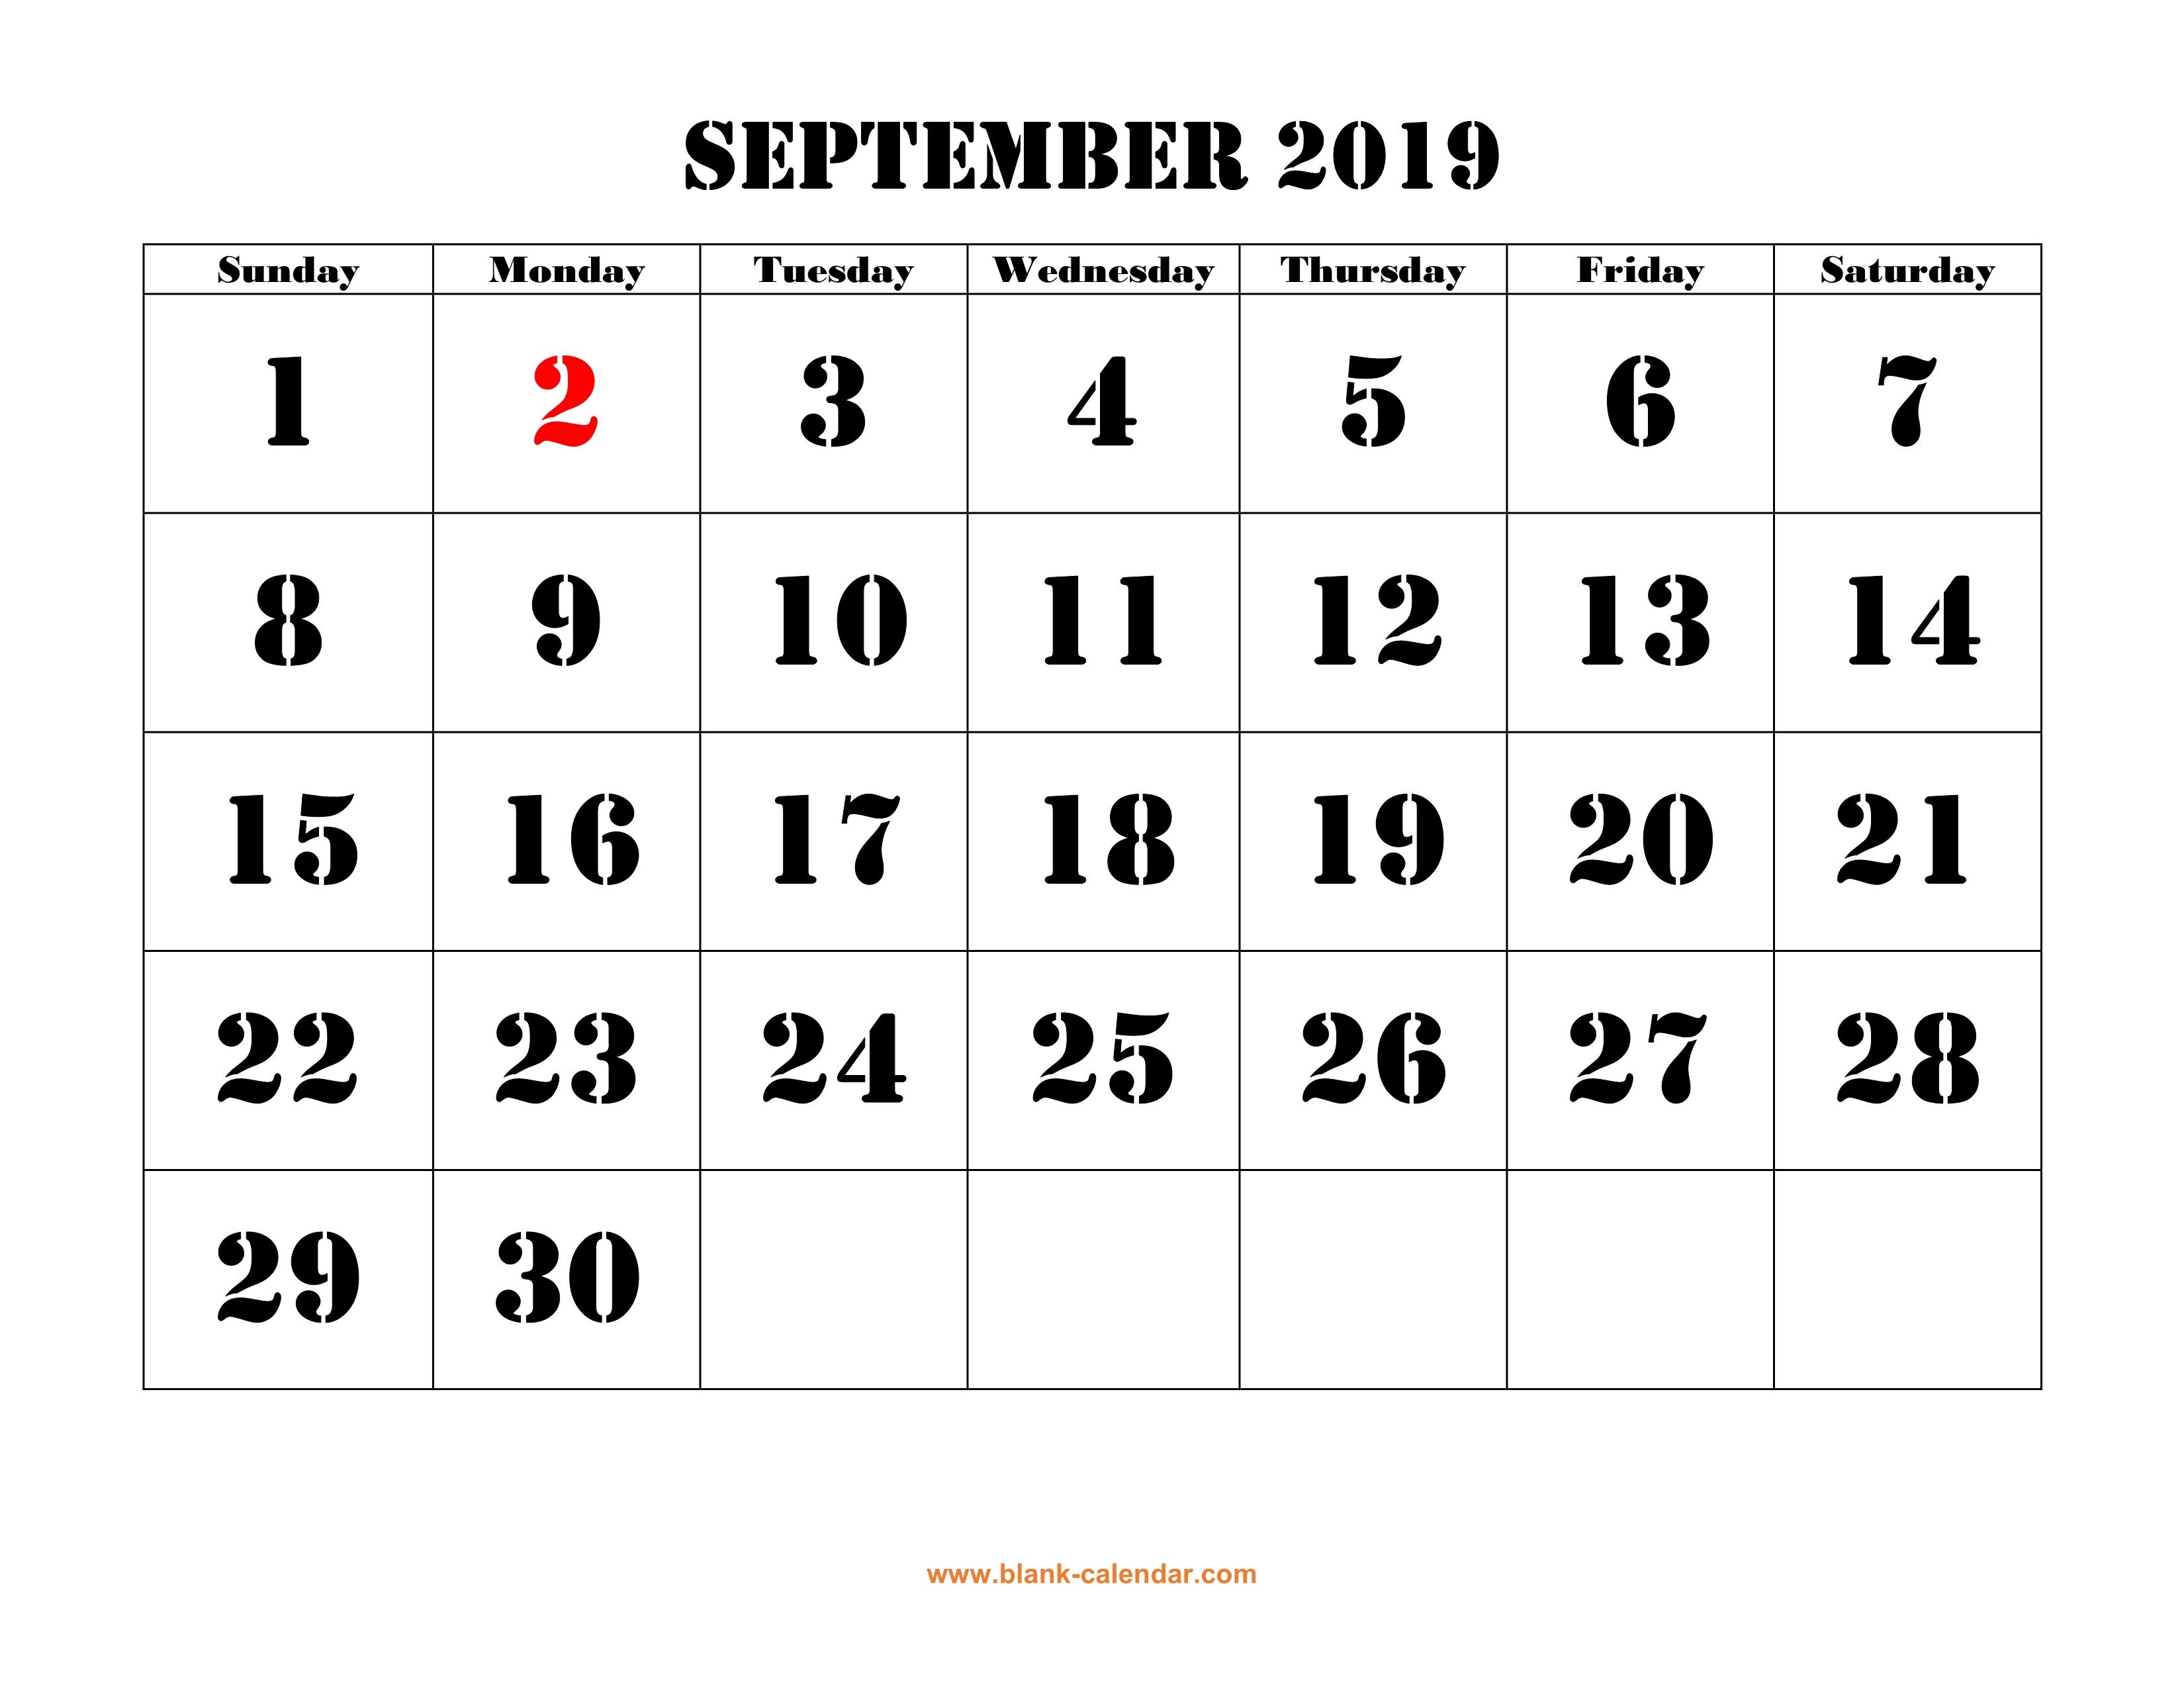 Free Download Printable September 2019 Calendar, Large Font Design regarding Blank September Calendar Printable With Holidays